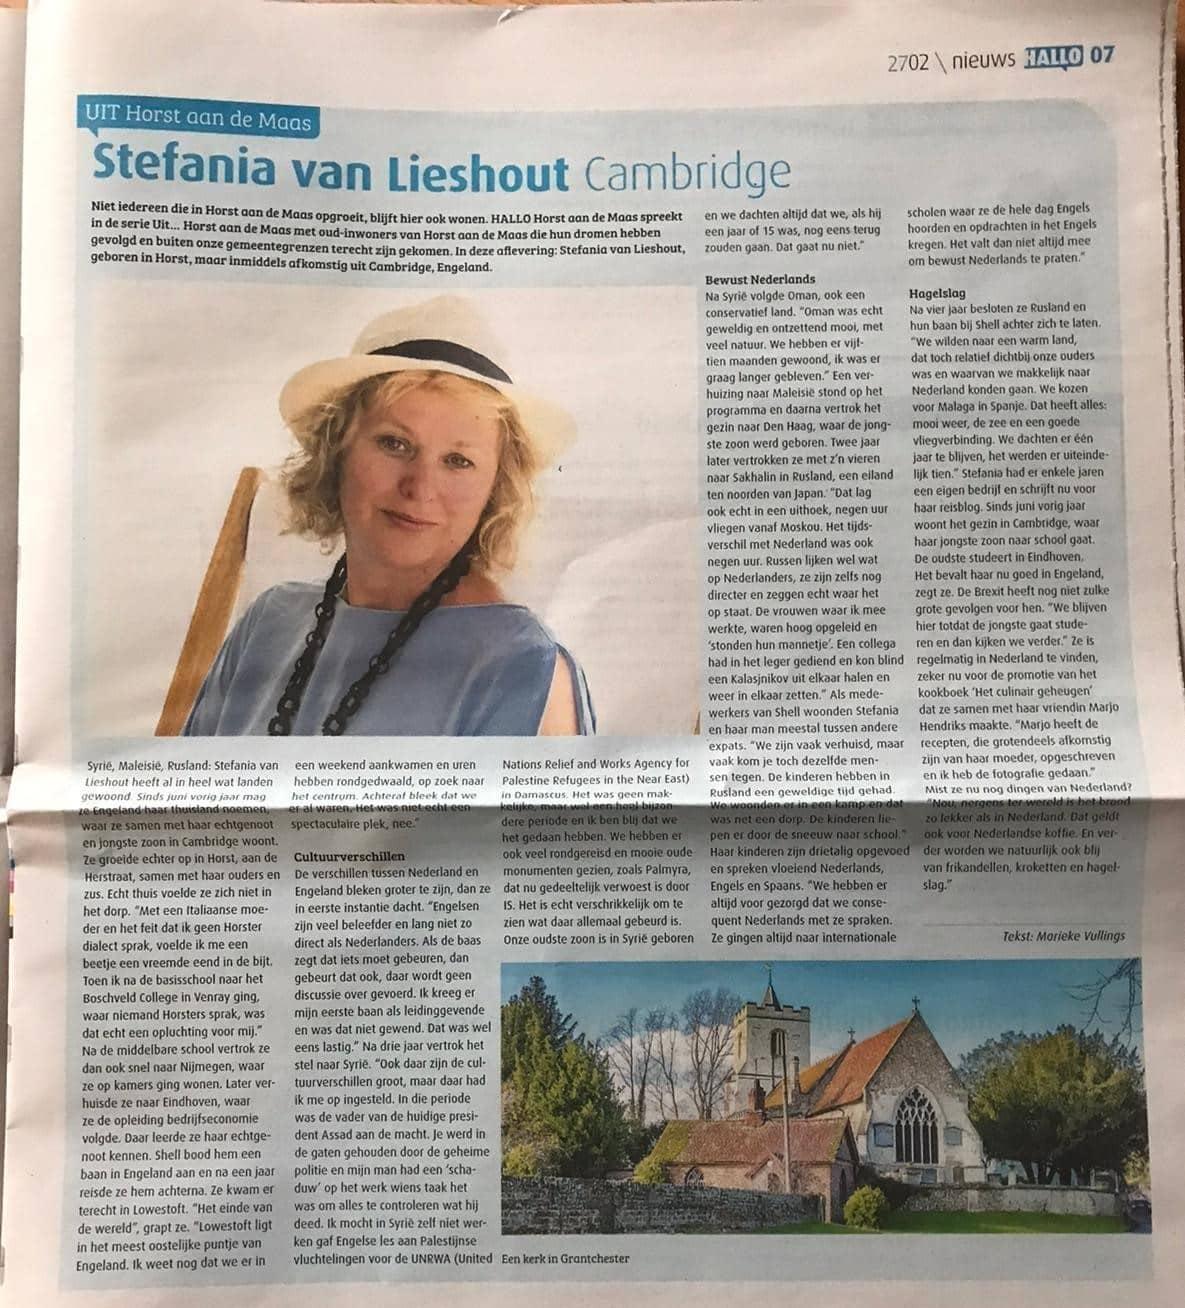 Interview Hallo Horst Stefania van Lieshout